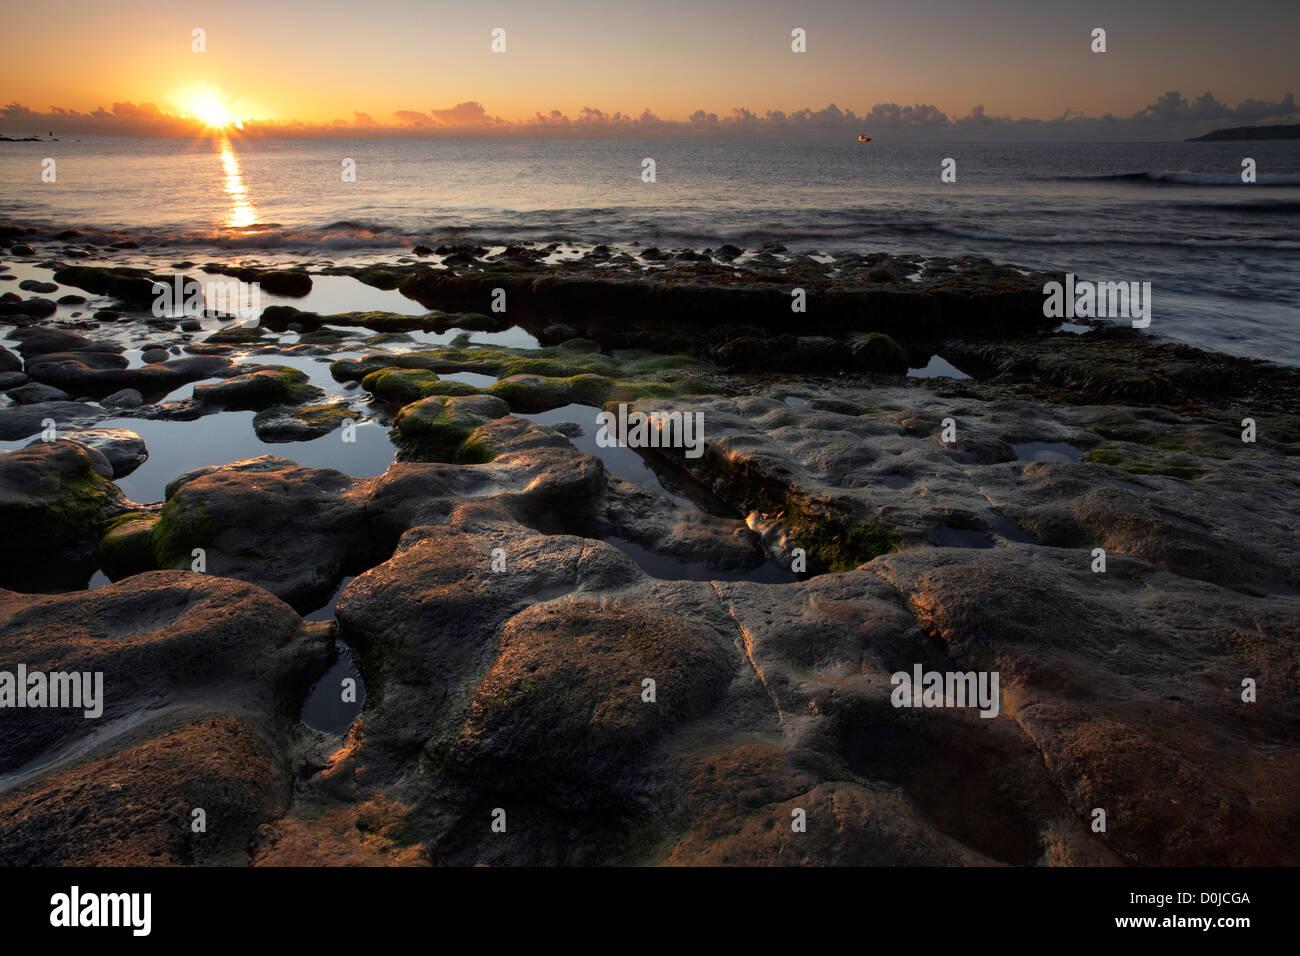 Sunrise over Osmington Mills beach on the Jurassic Dorset coast. - Stock Image